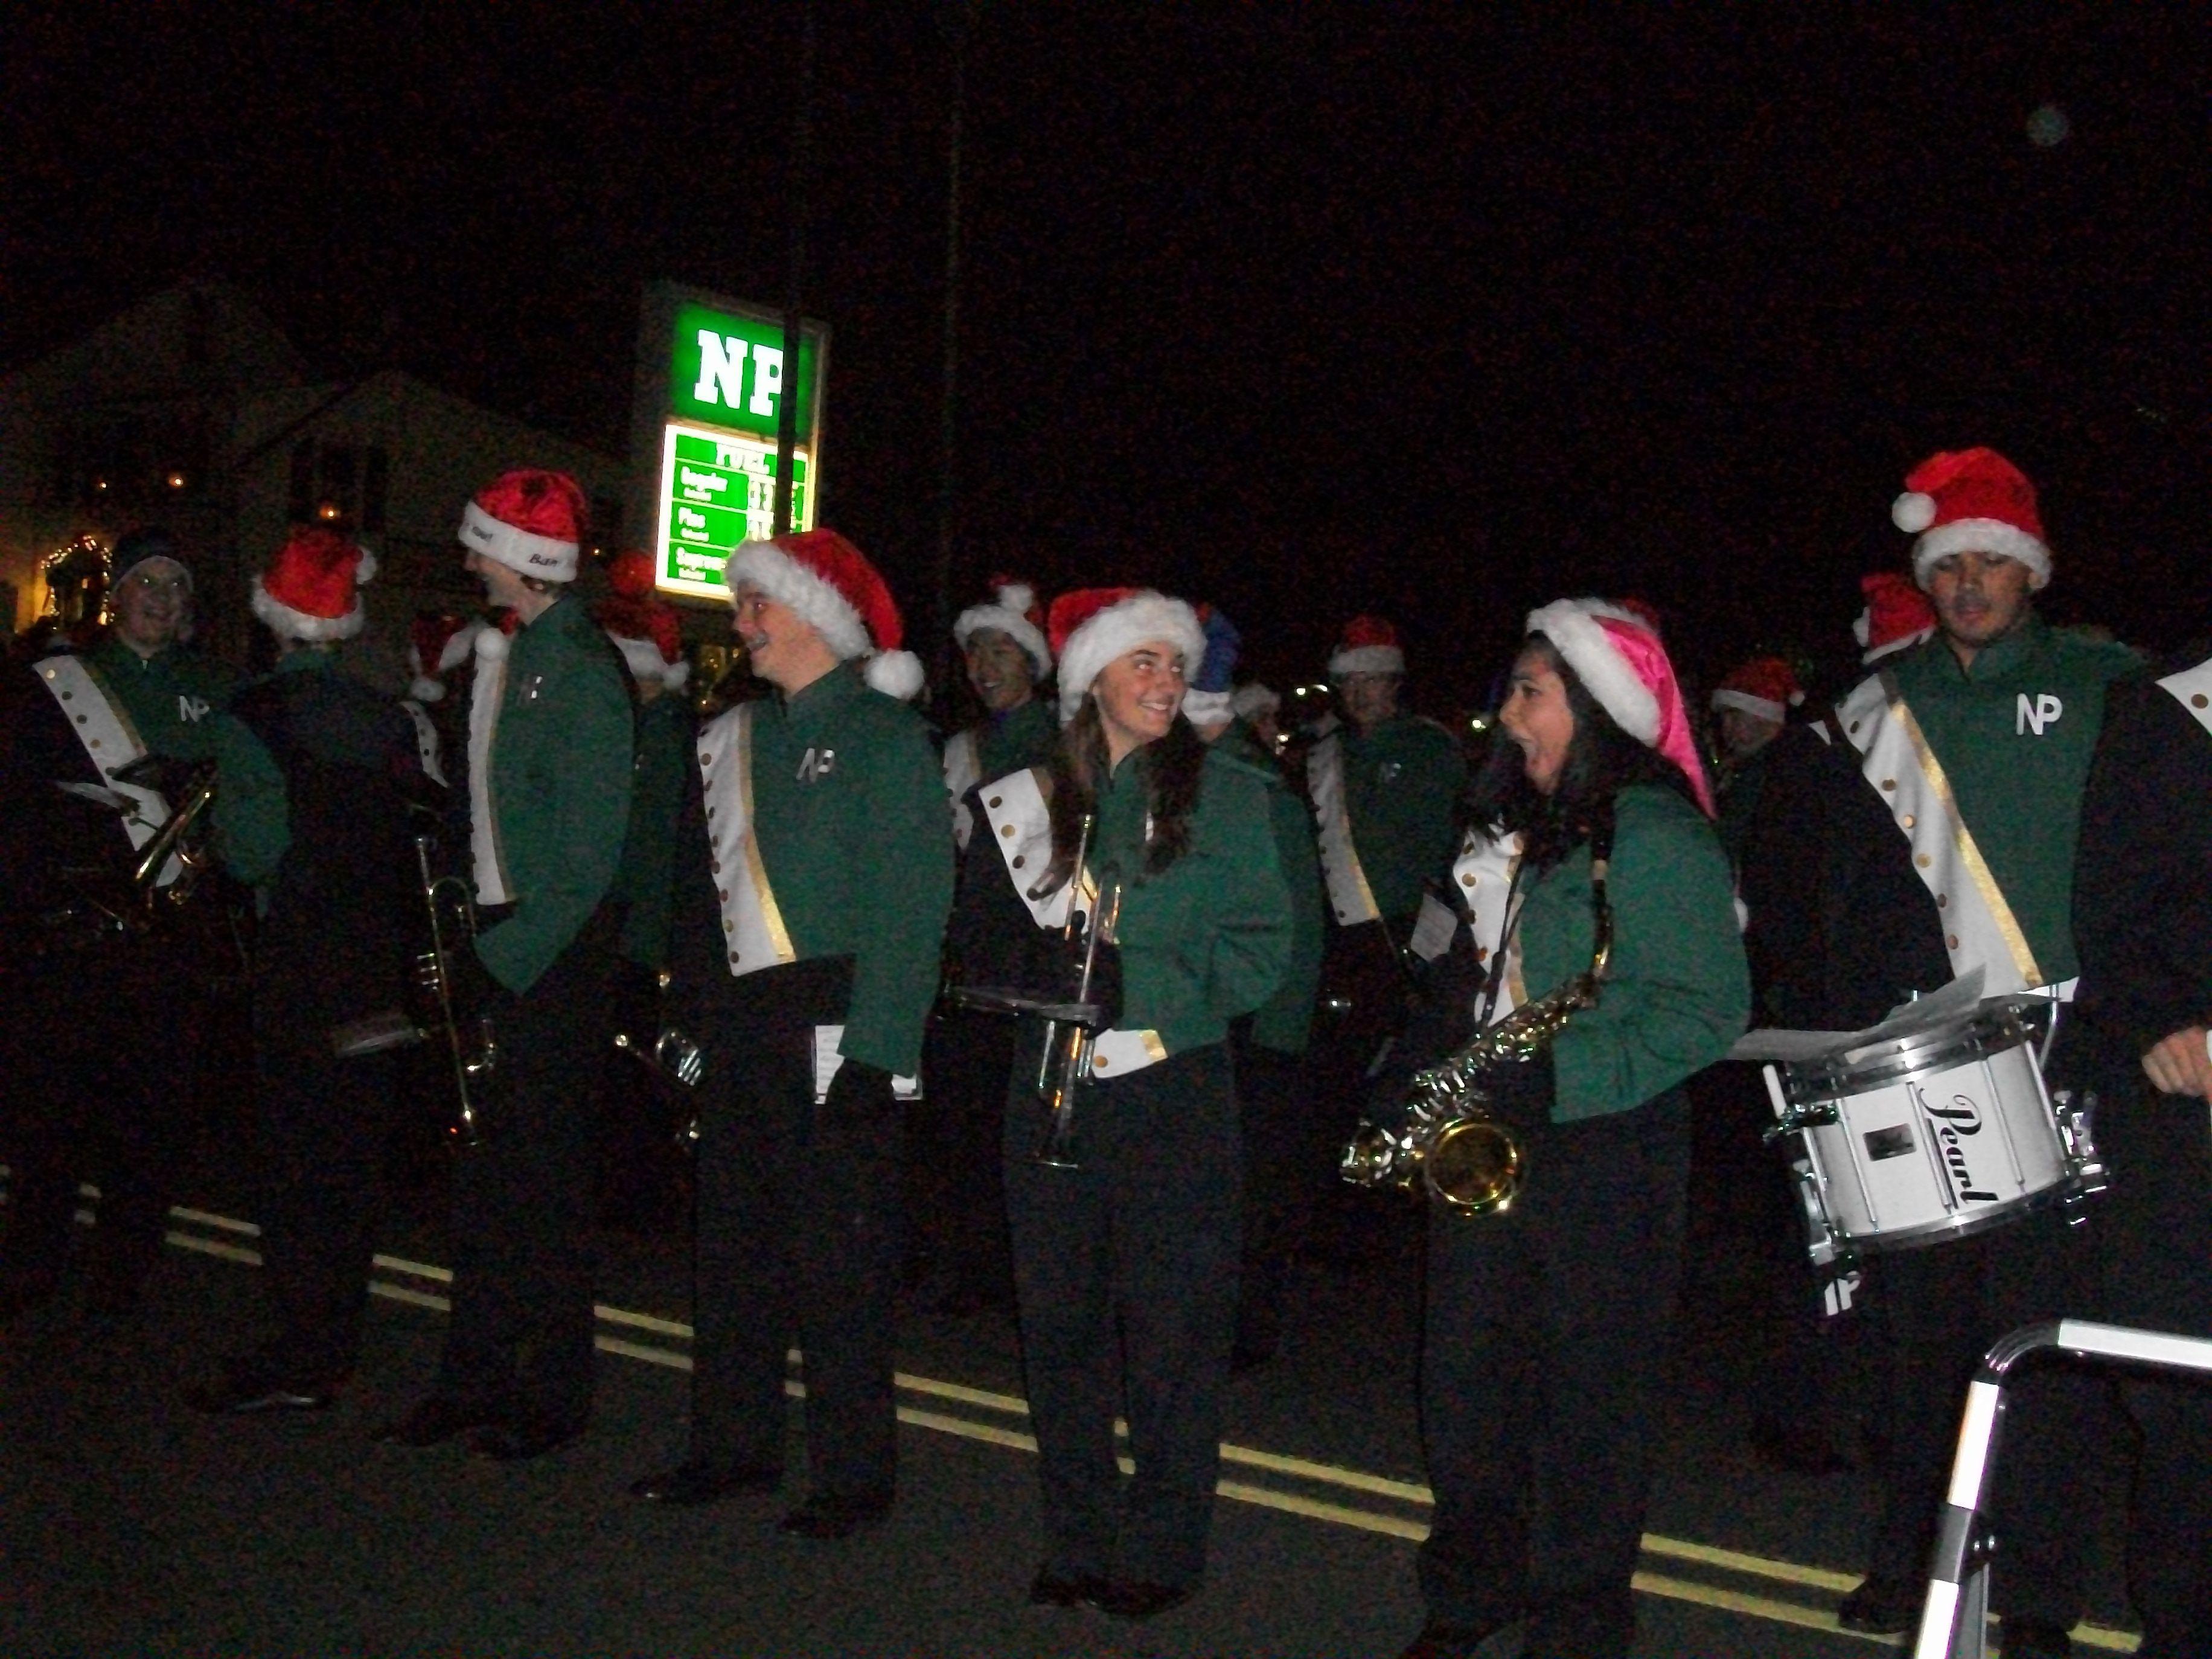 513ee81b9bb8883cfc4d_nphs_pioneer_marching_band_reacts_to_santa.jpg